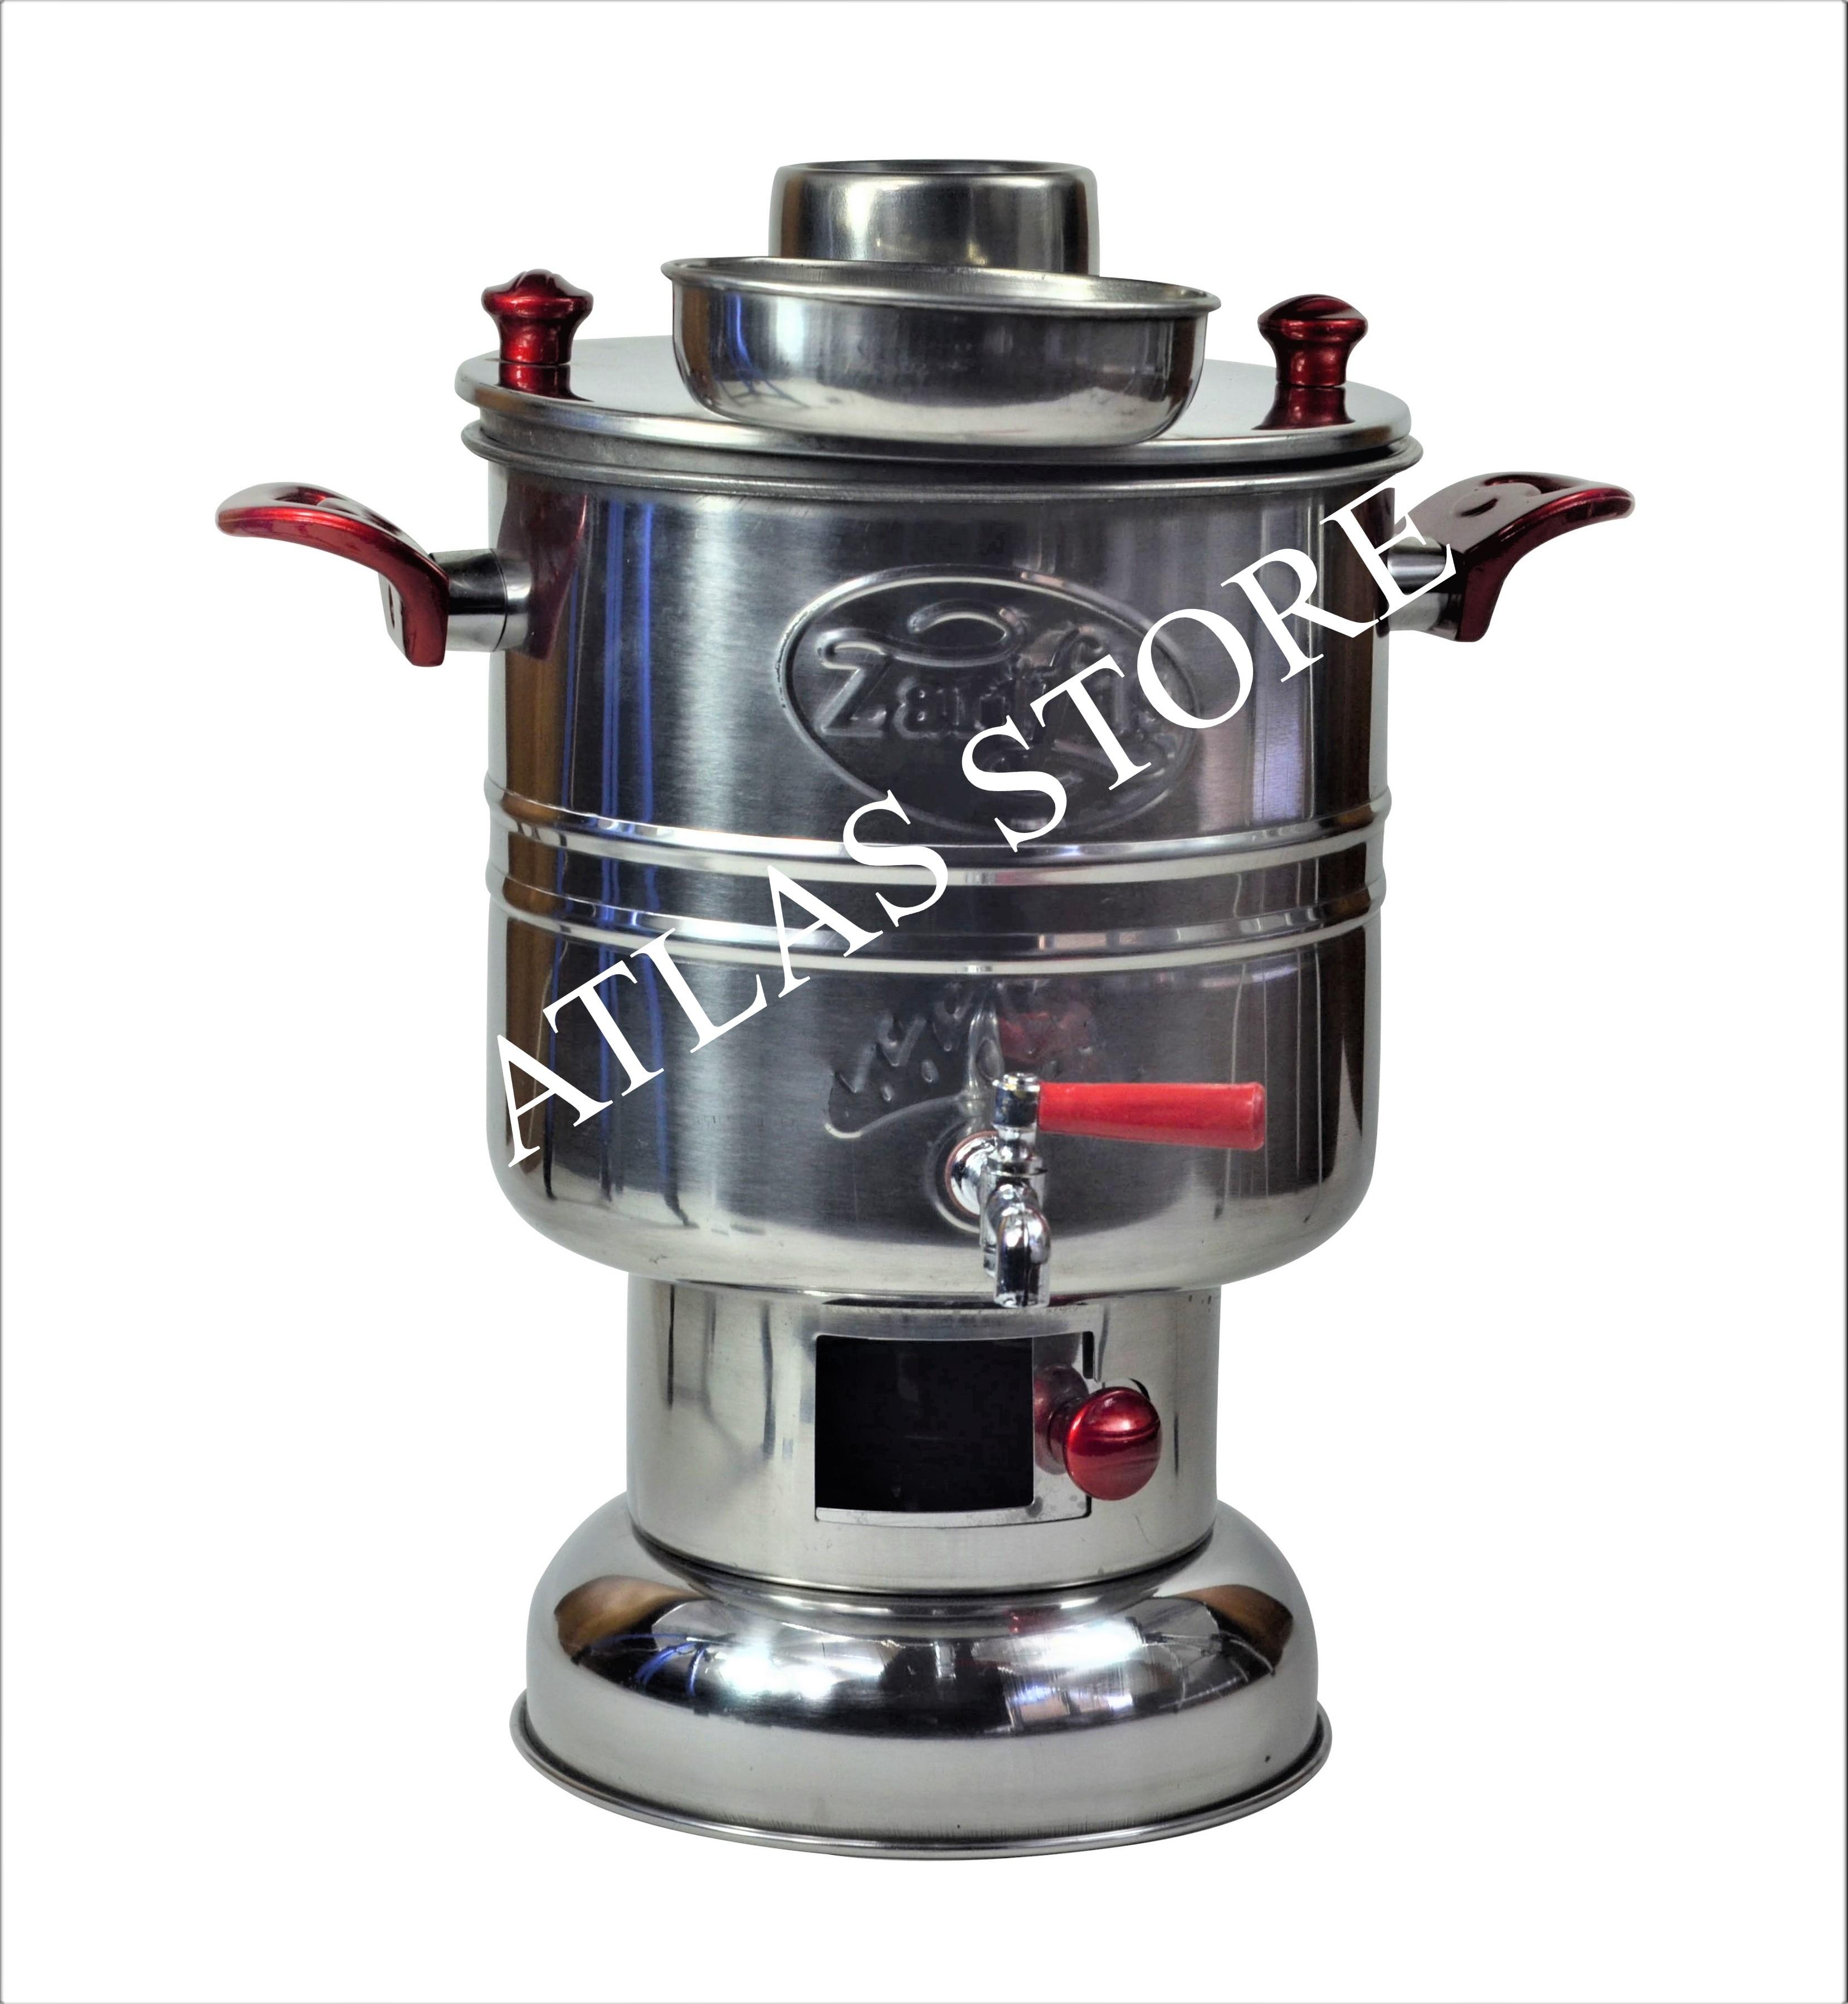 Wood Coal Stove Camp Steel Samovar  With 2 HandlesTea Coffee Maker With Charcoal